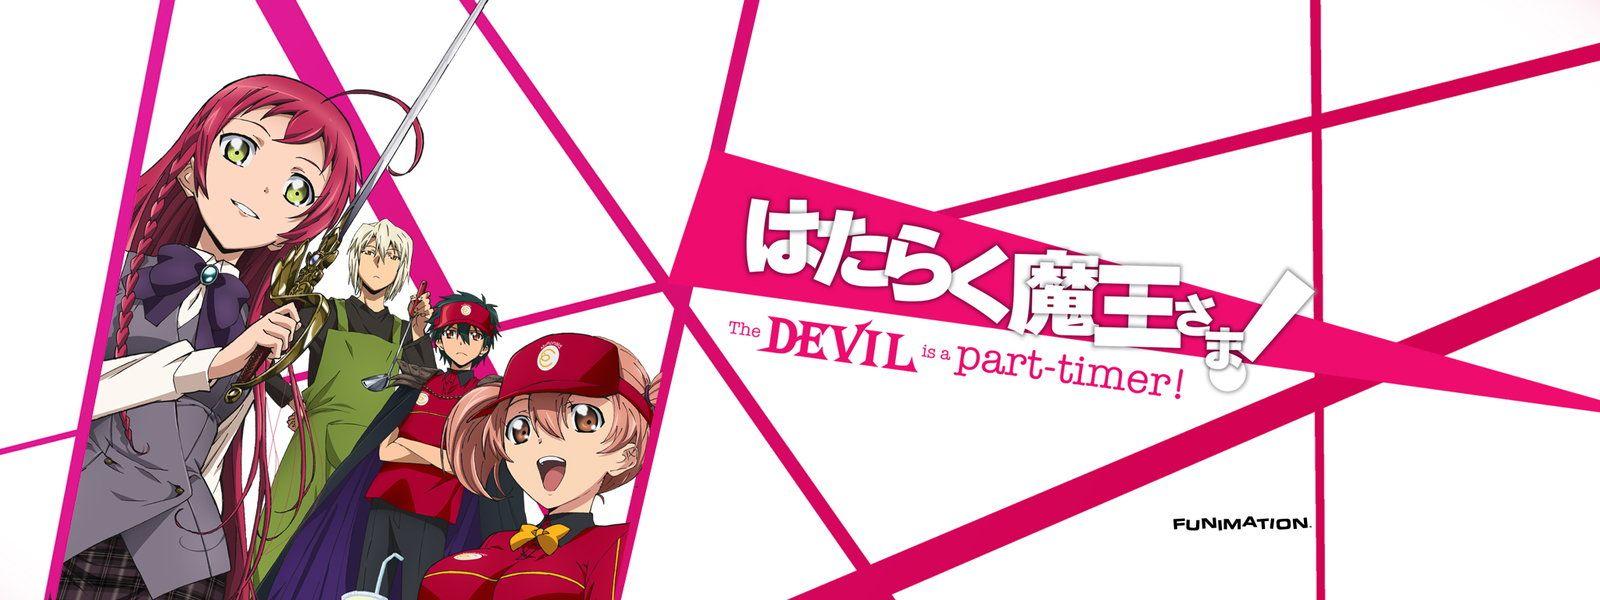 Pin em The Devil is a PartTimer